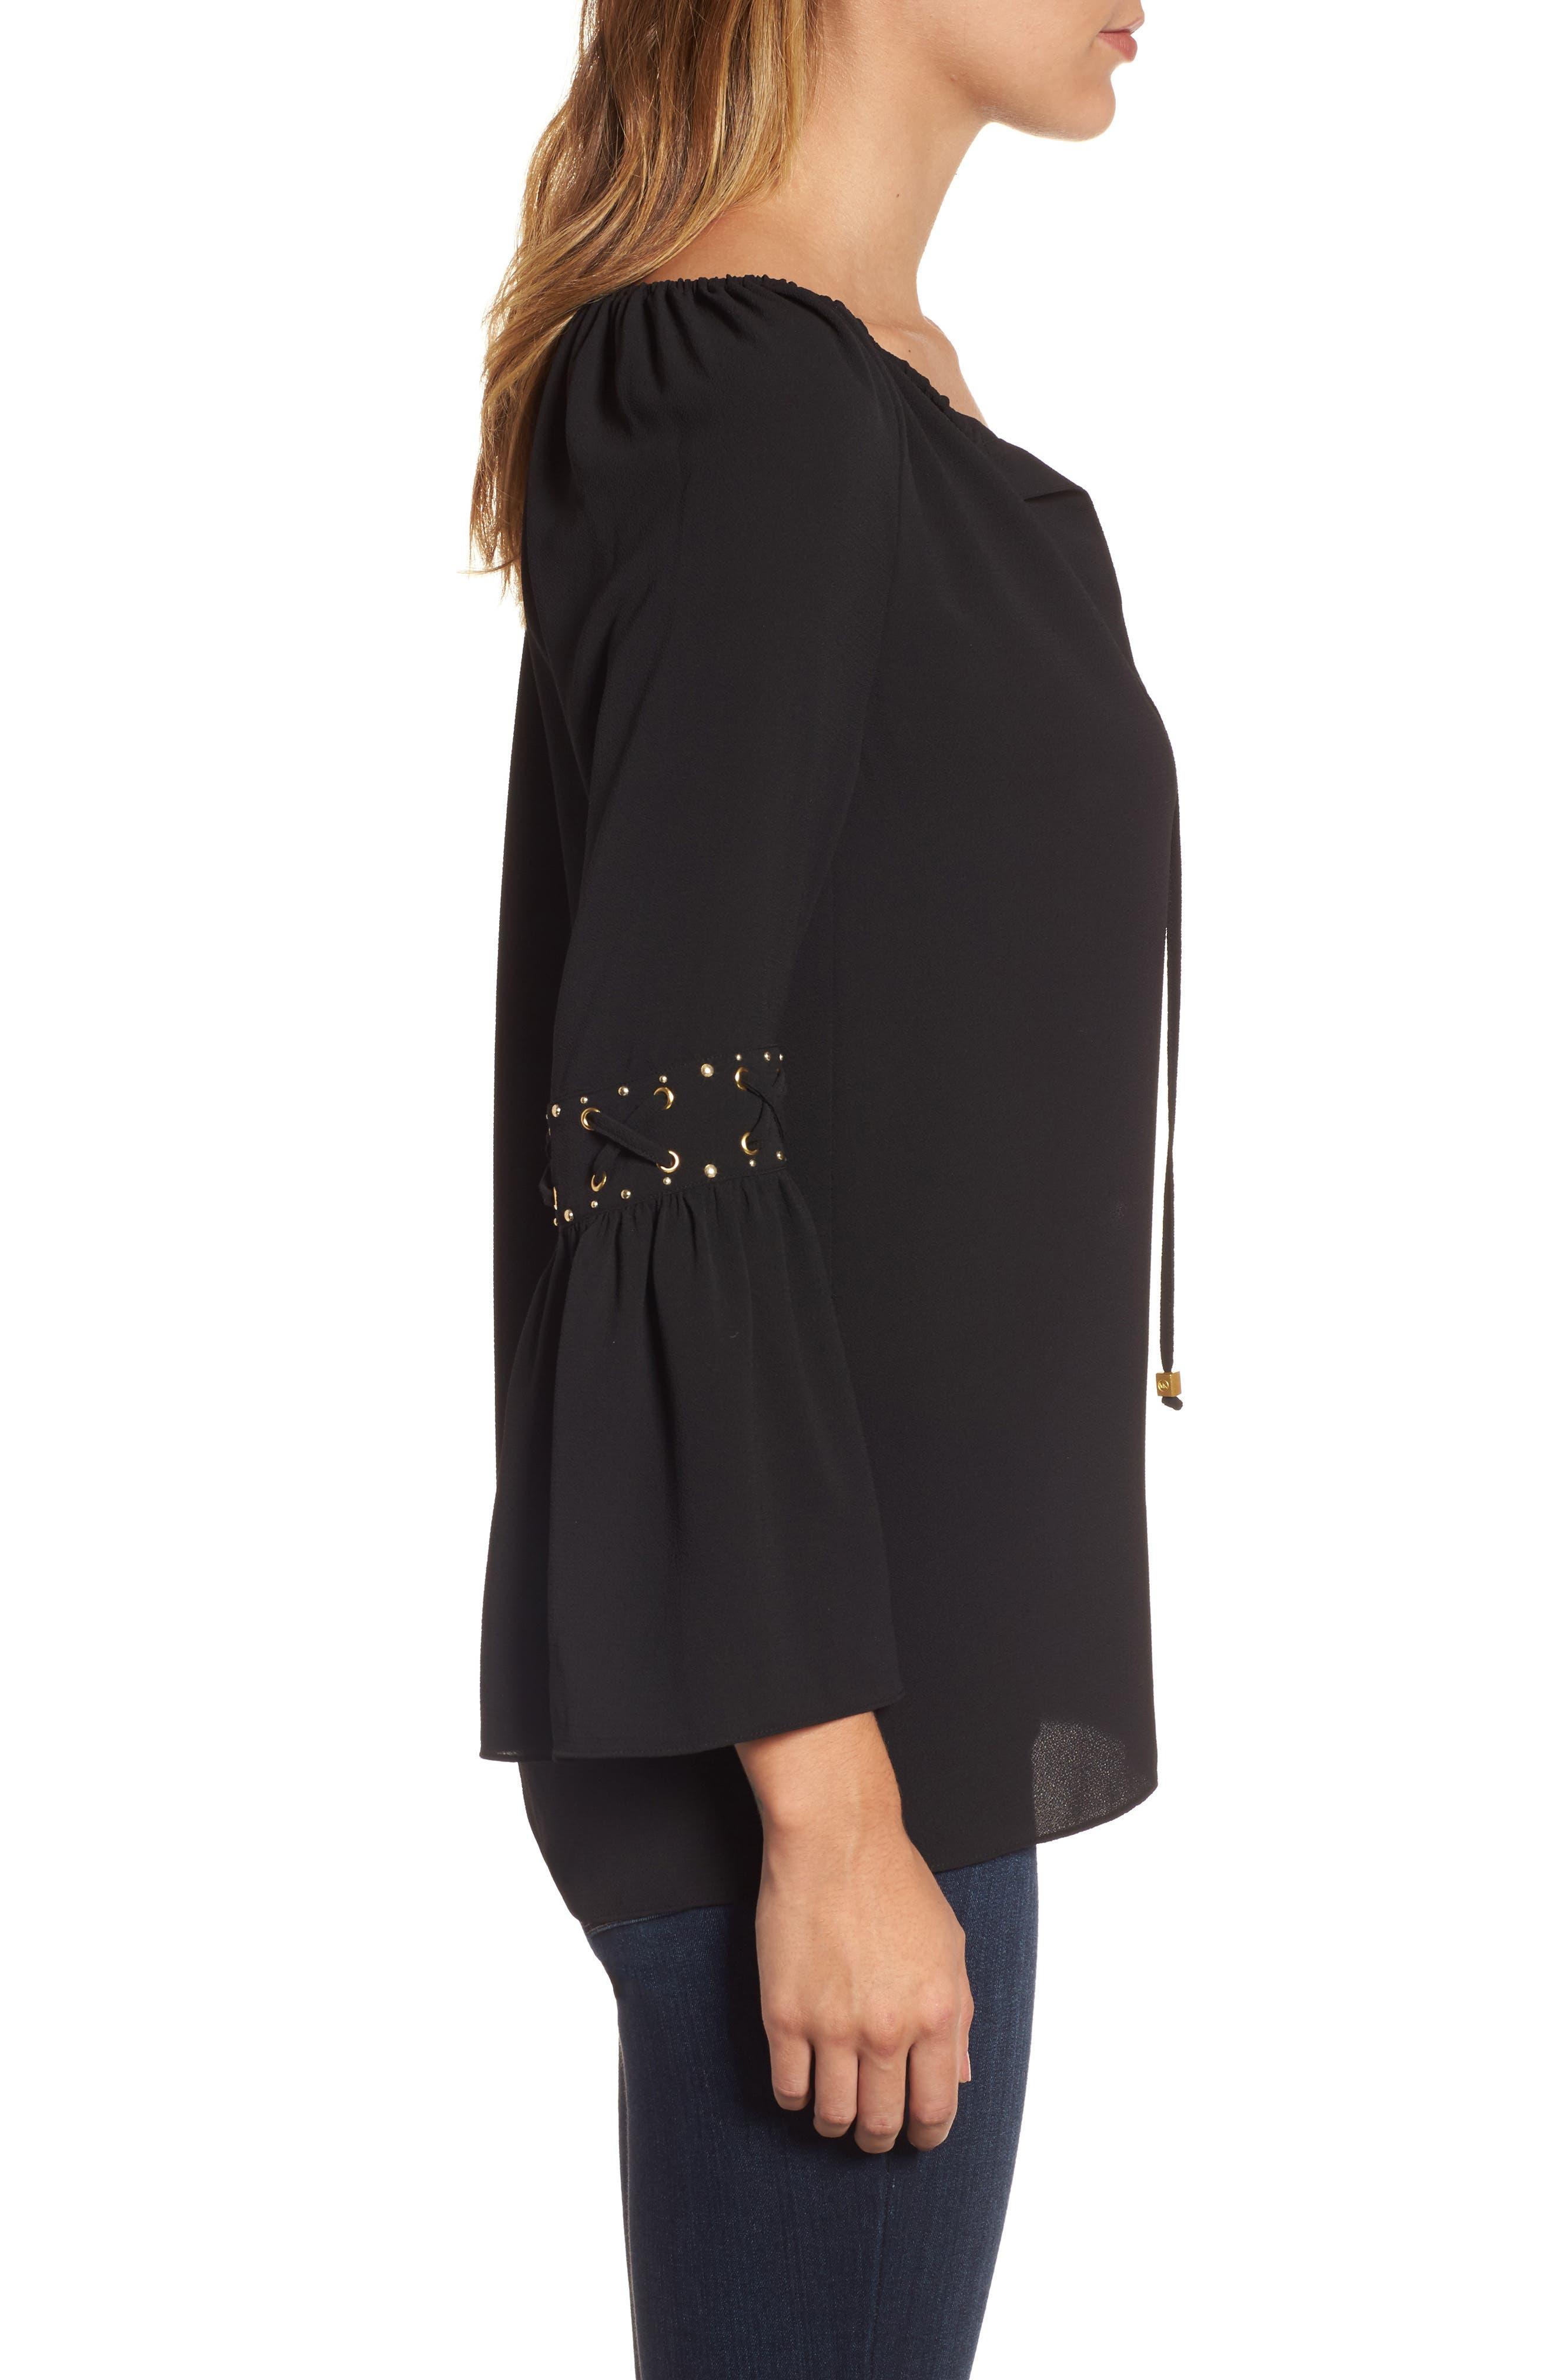 Alternate Image 3  - MICHAEL Michael Kors Lace-Up Sleeve Top